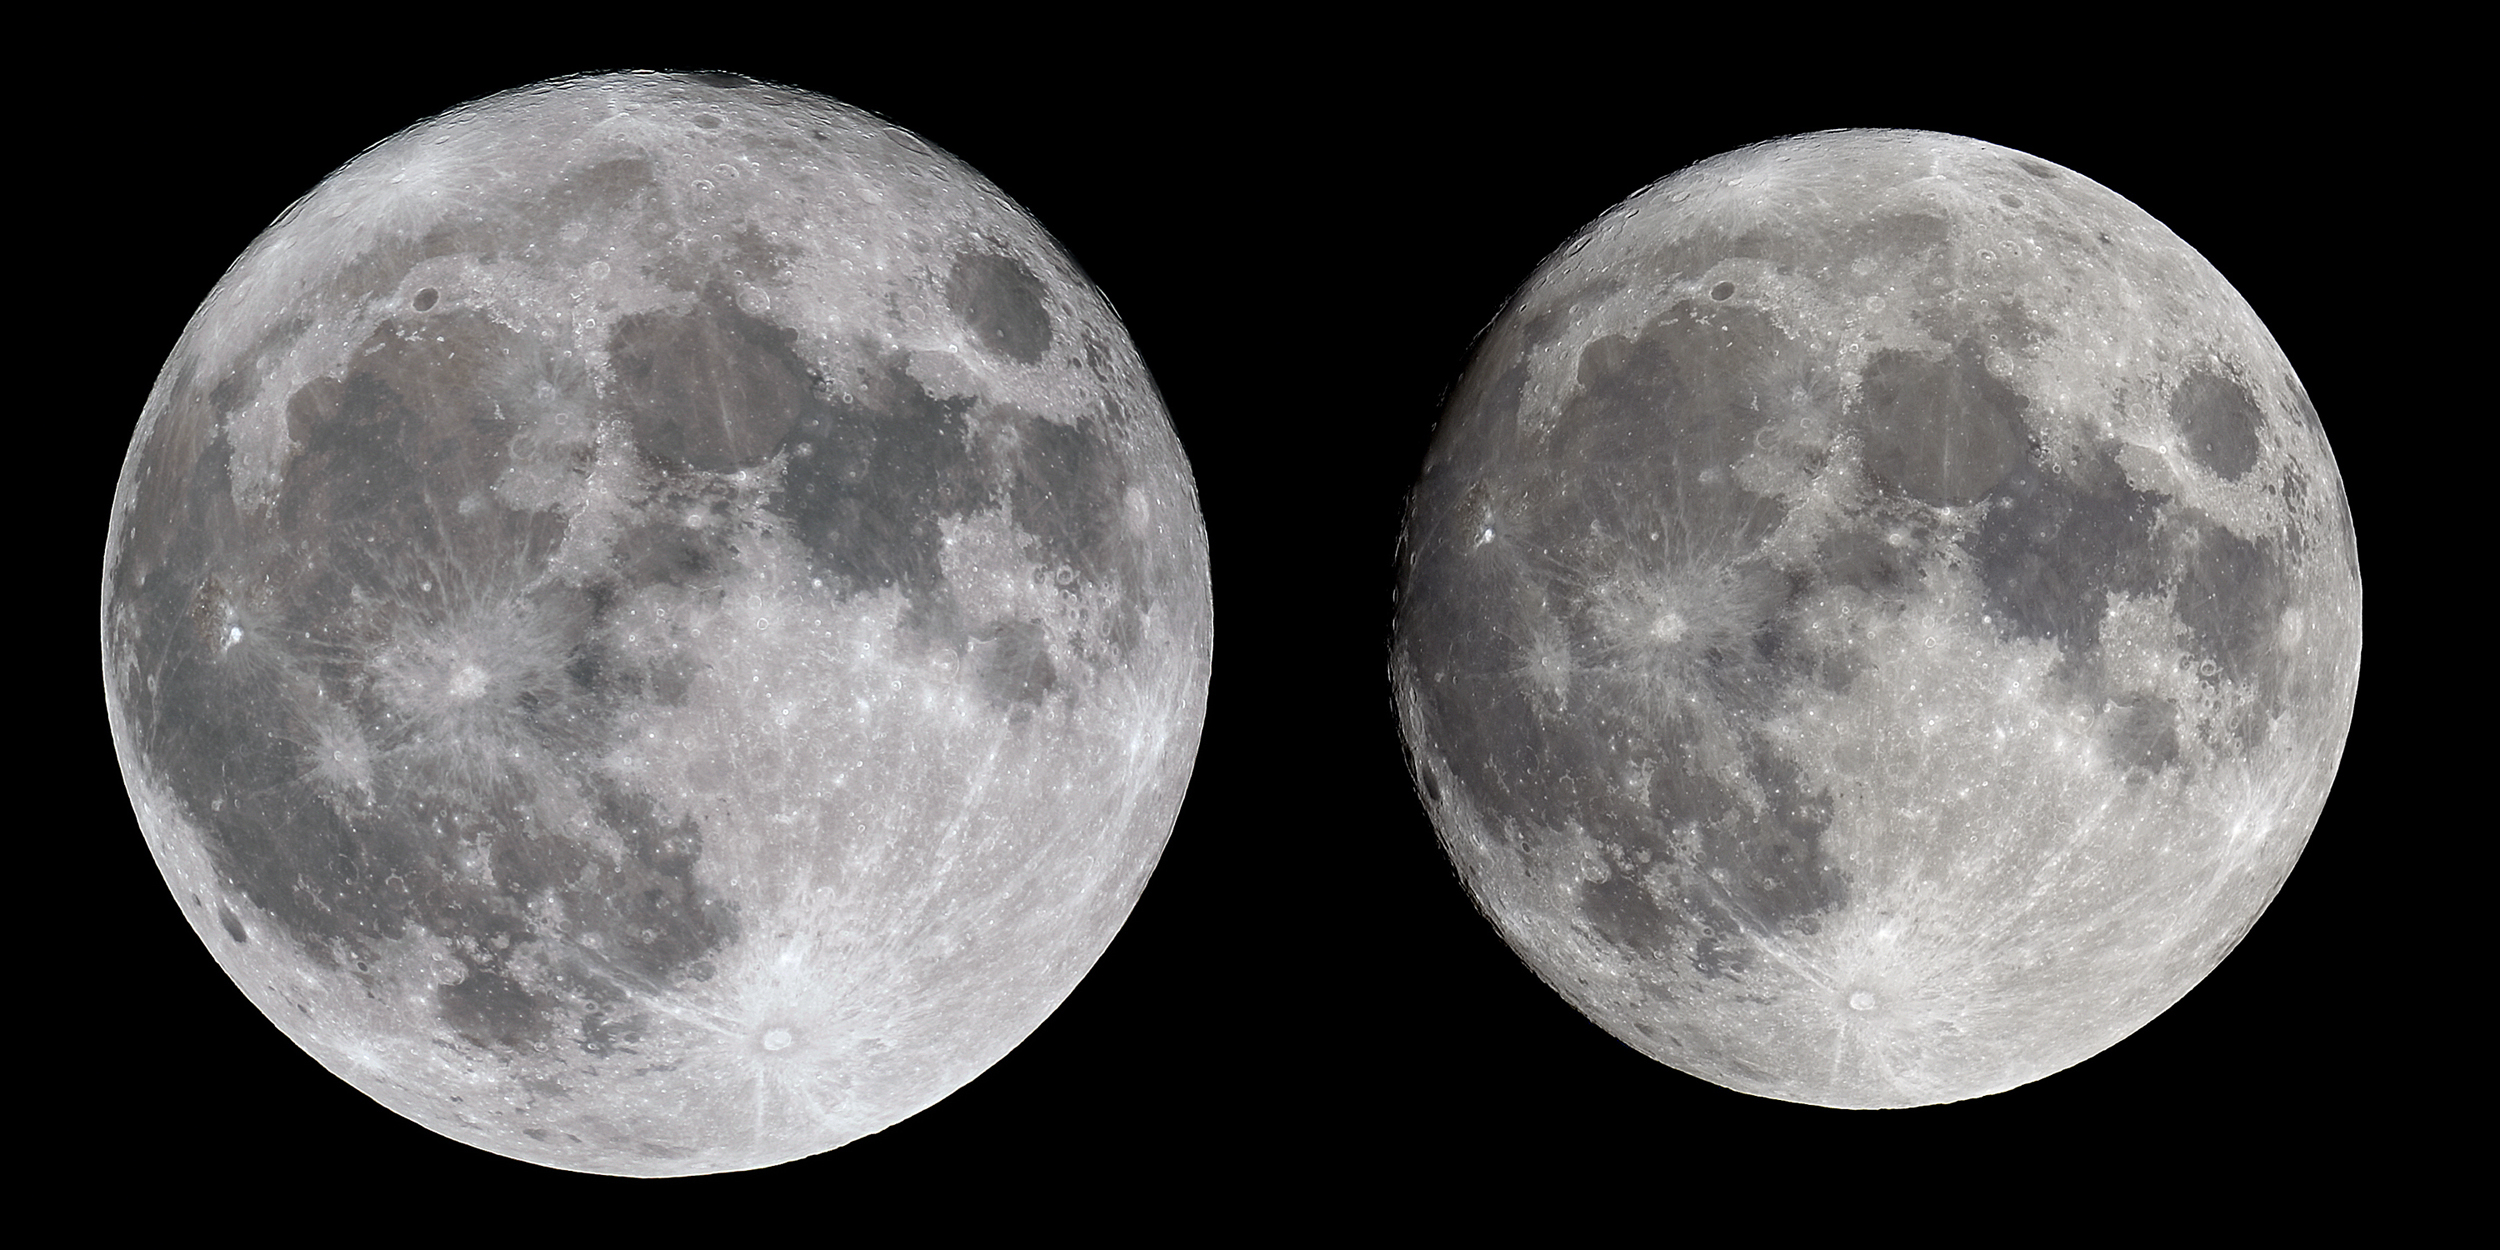 13-moon_20110319_20090606_apogee_perigee